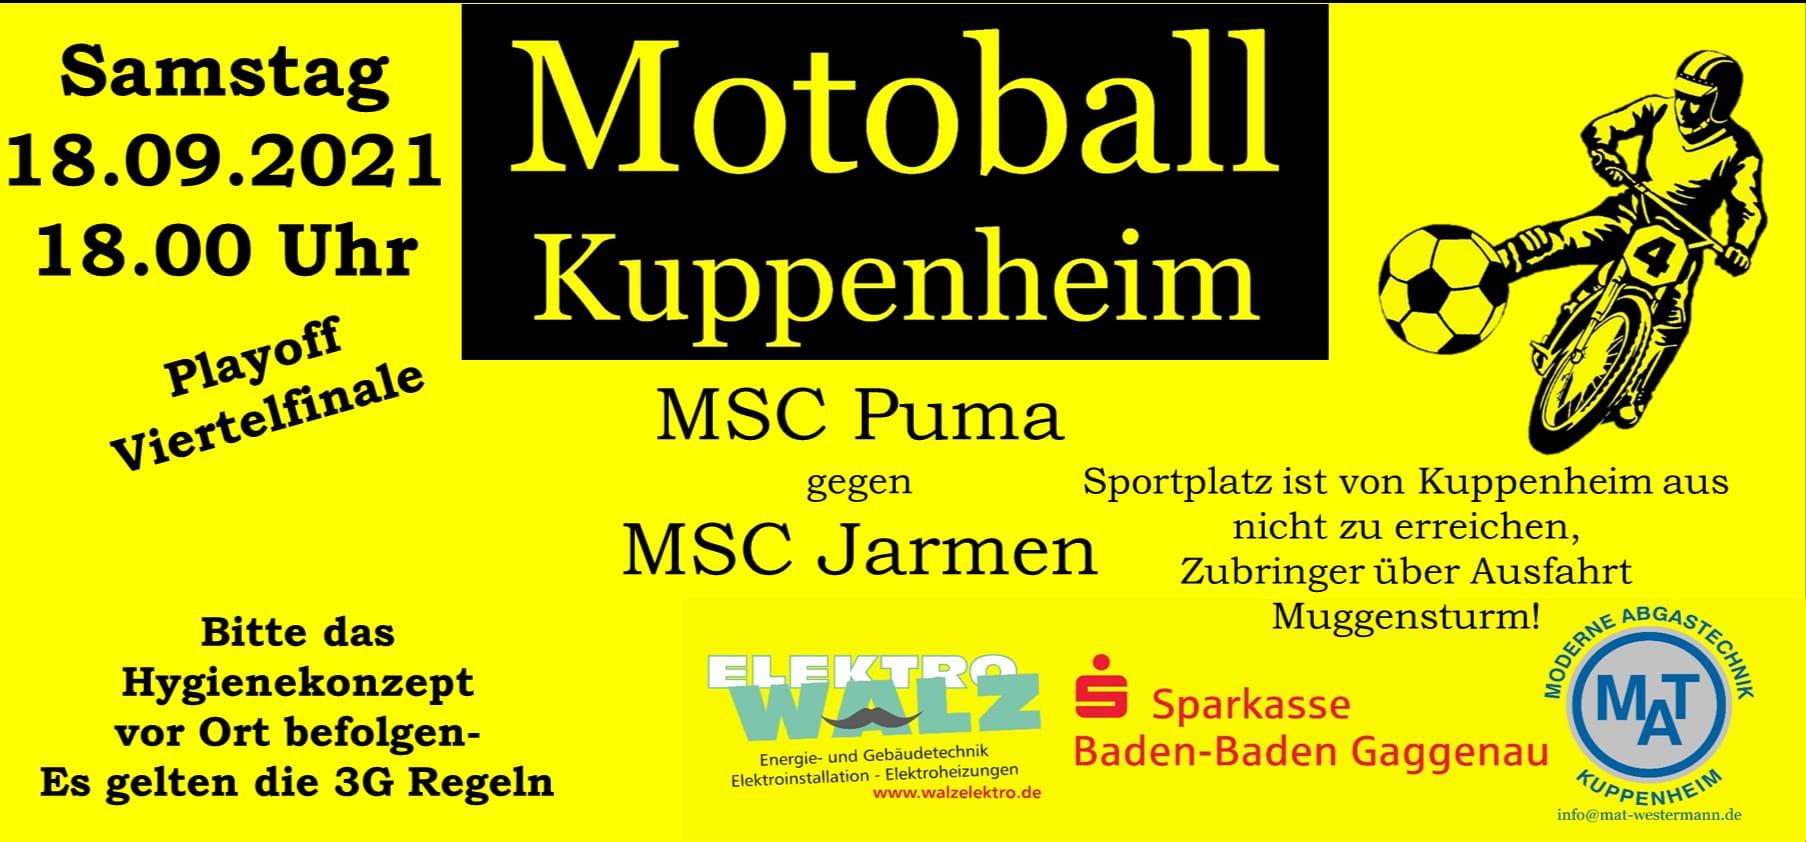 PlayOff 1/4 Finale Rückspiel: MSC Jarmen – MSC Puma